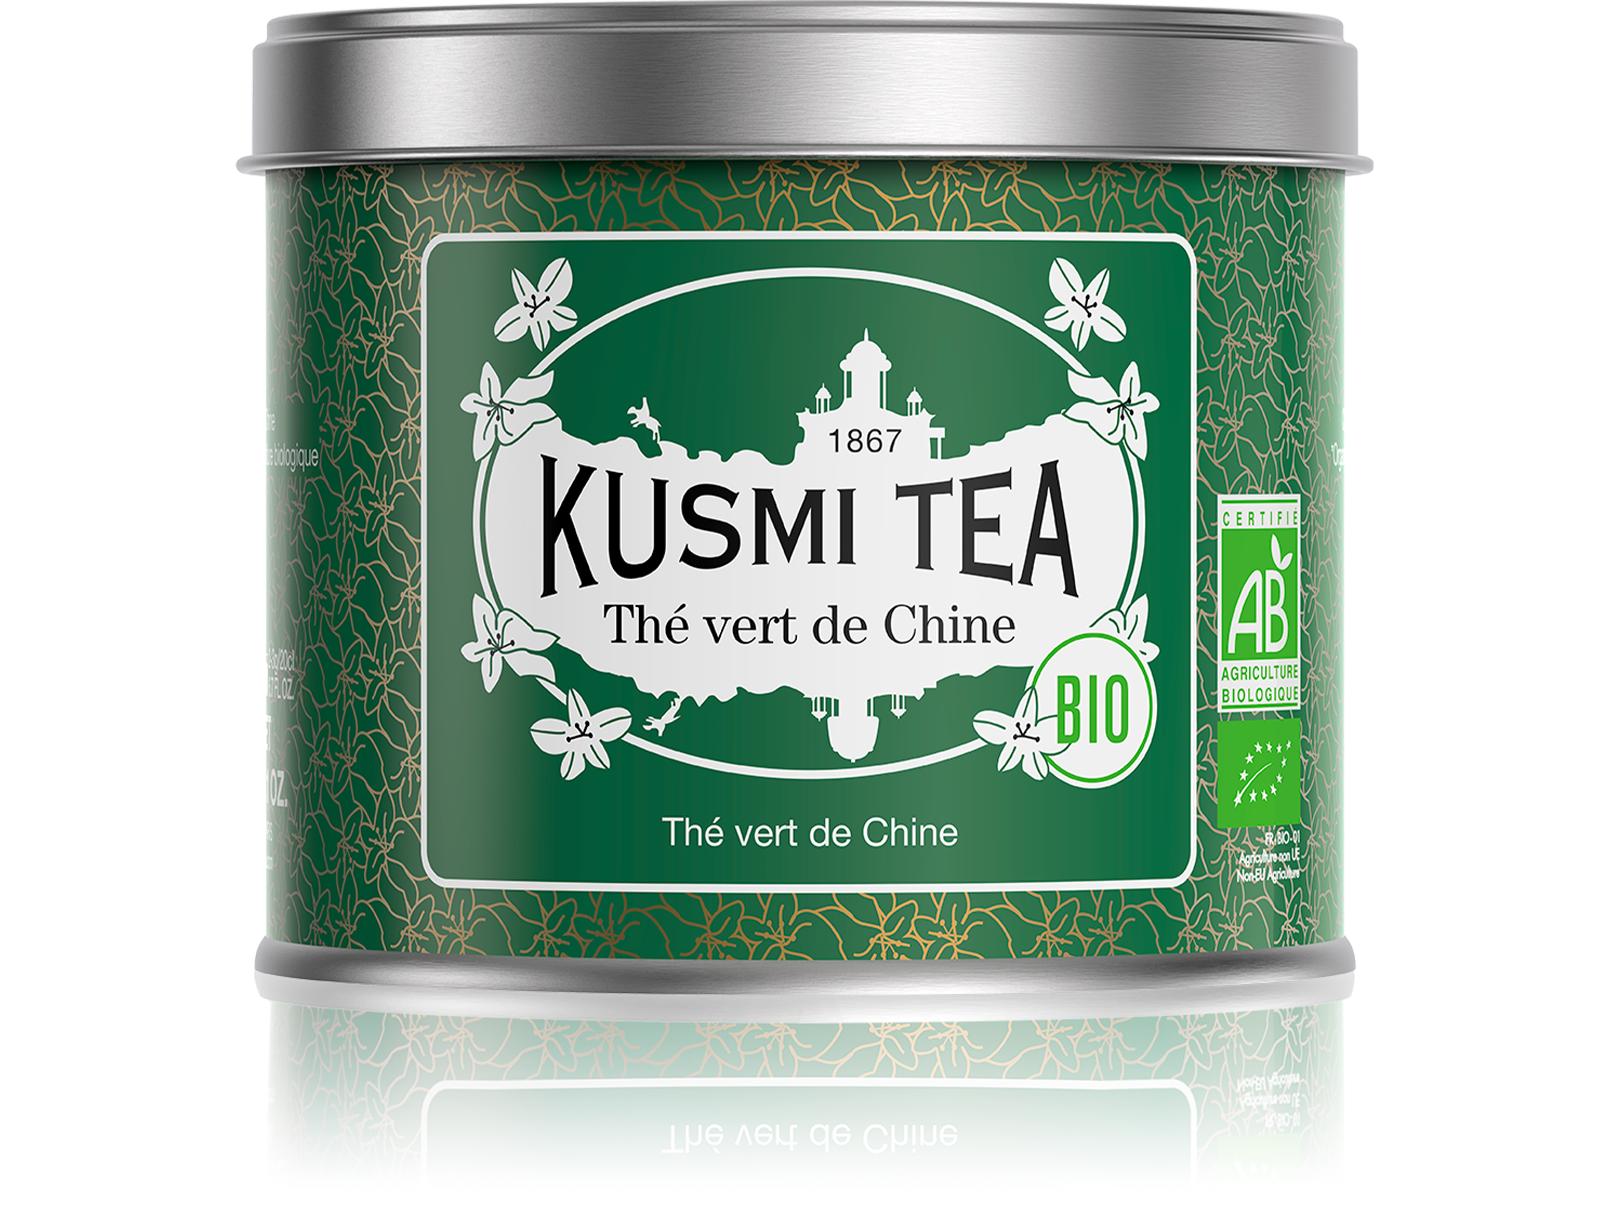 KUSMI TEA Thé Vert de Chine Bio Kusmi Tea